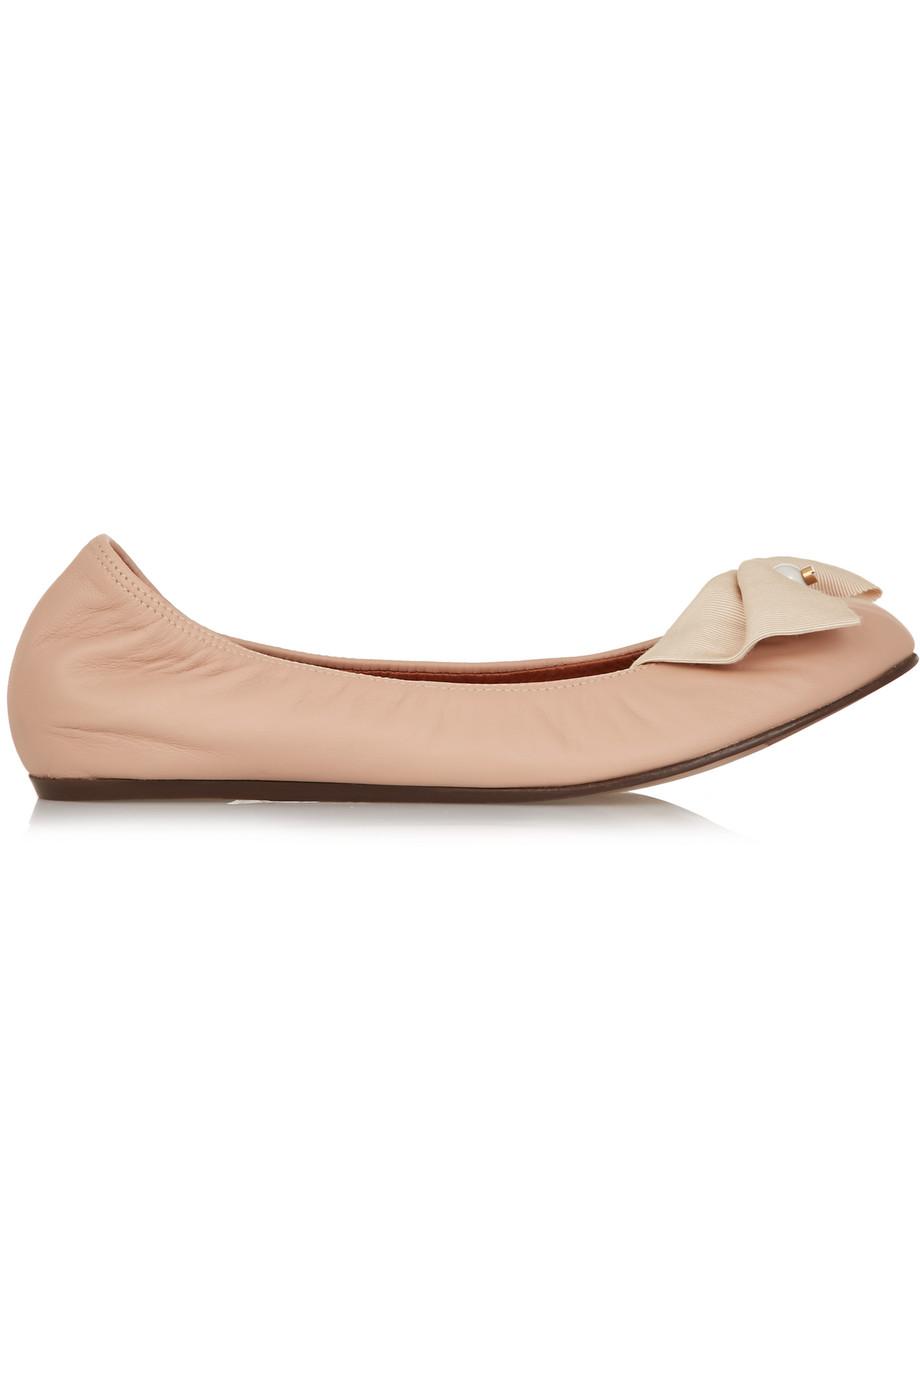 Lanvin Bow-Embellished Leather Ballet Flats, Blush, Women's US Size: 5, Size: 35.5